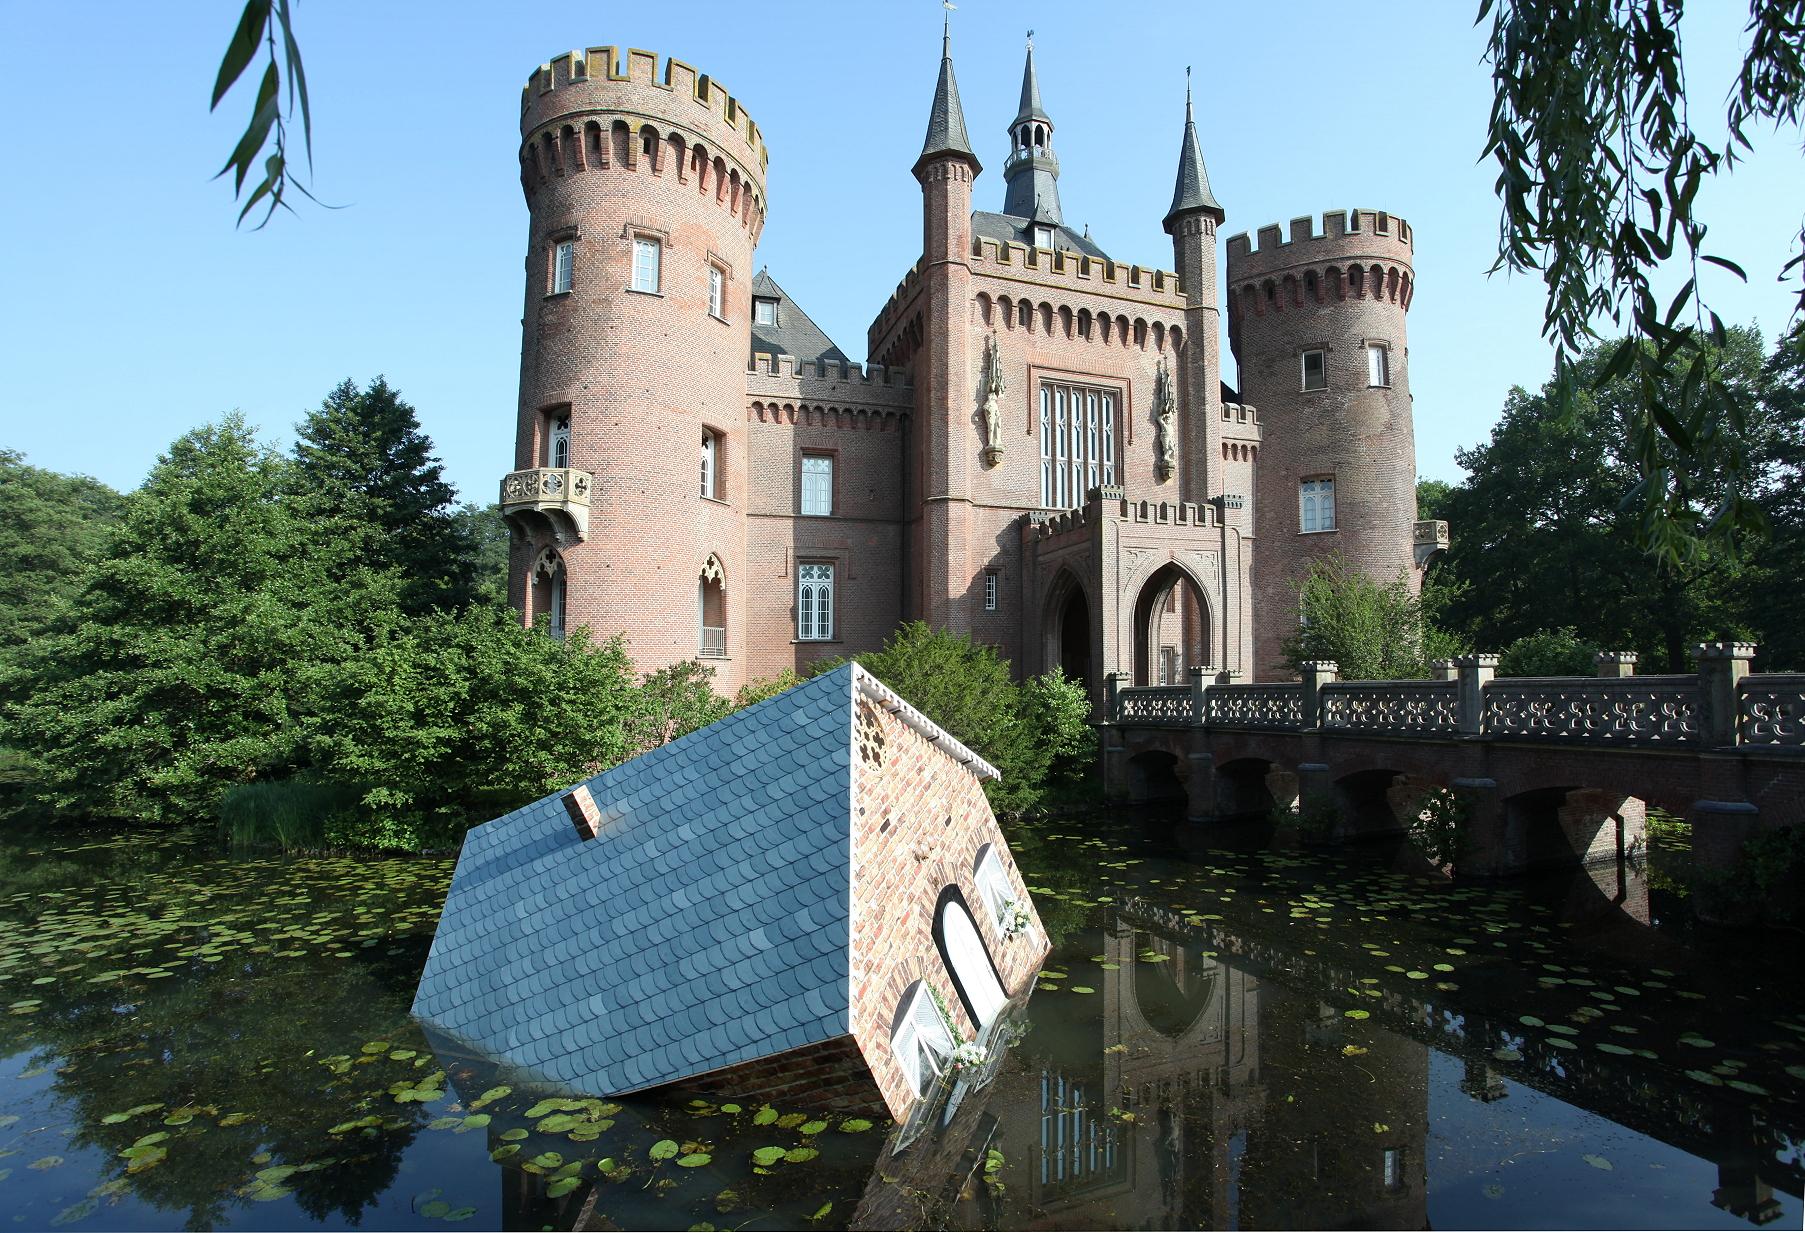 Tea Mäkipää & Halldór Úlfarsson, Atlantis, 2007 (2017). Installationsansicht im Museum Schloss Moyland. Foto: Stiftung Museum Schloss Moyland/Maurice Dorren